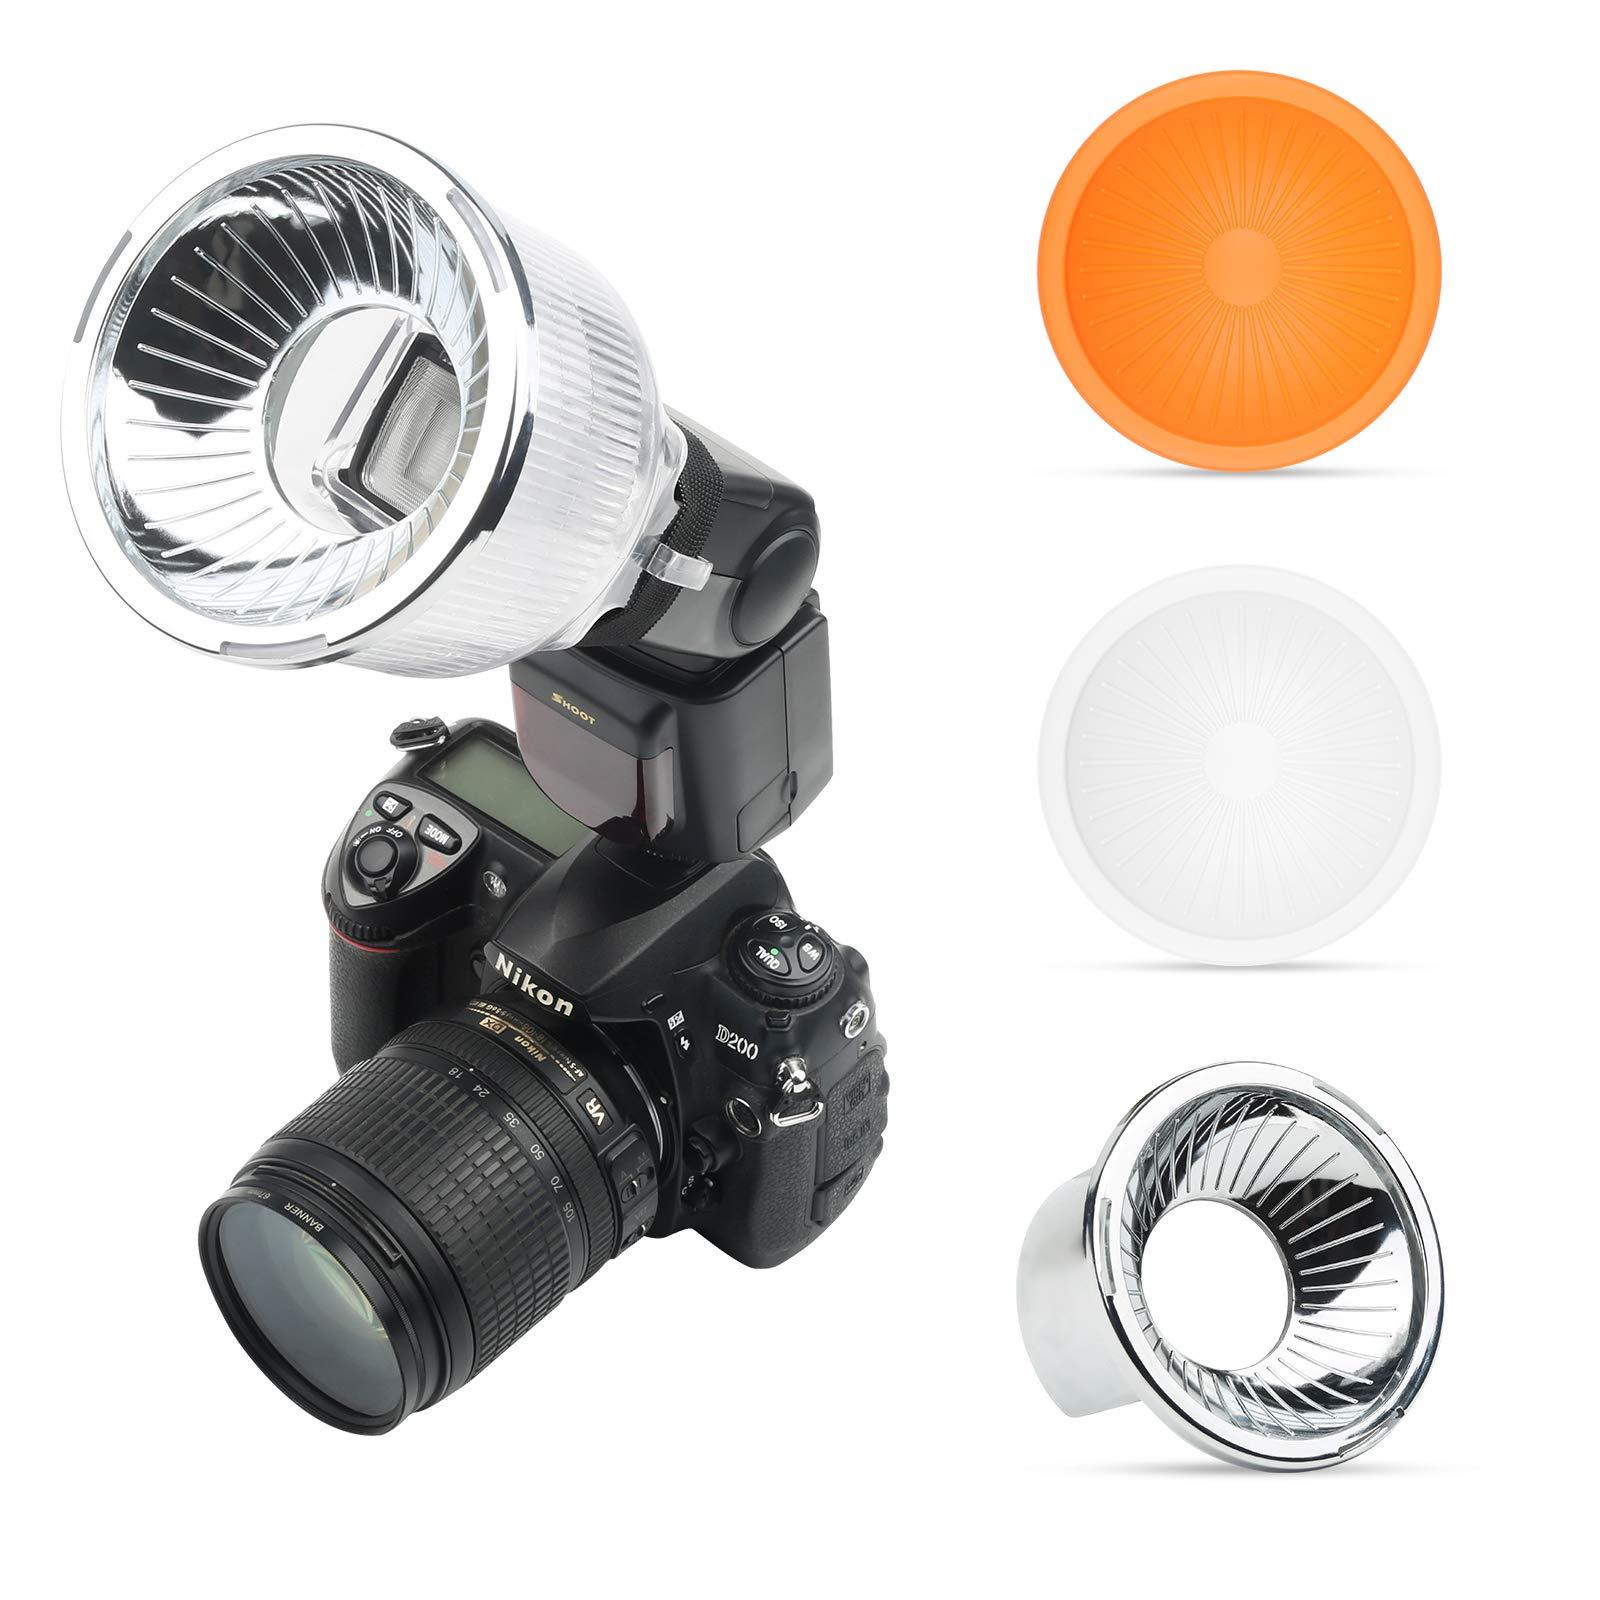 SHOOT Lambancy Dome Flash Speedlight Diffuser (Orange,Silver,White) for Canon 420EX 430EX 550EX 580EX 580EX II 600EX Nikon SB600 SB700 SB800 SB900 SB910 Sony HVL-F42AM and Other Similar Digital Camera by SHOOT